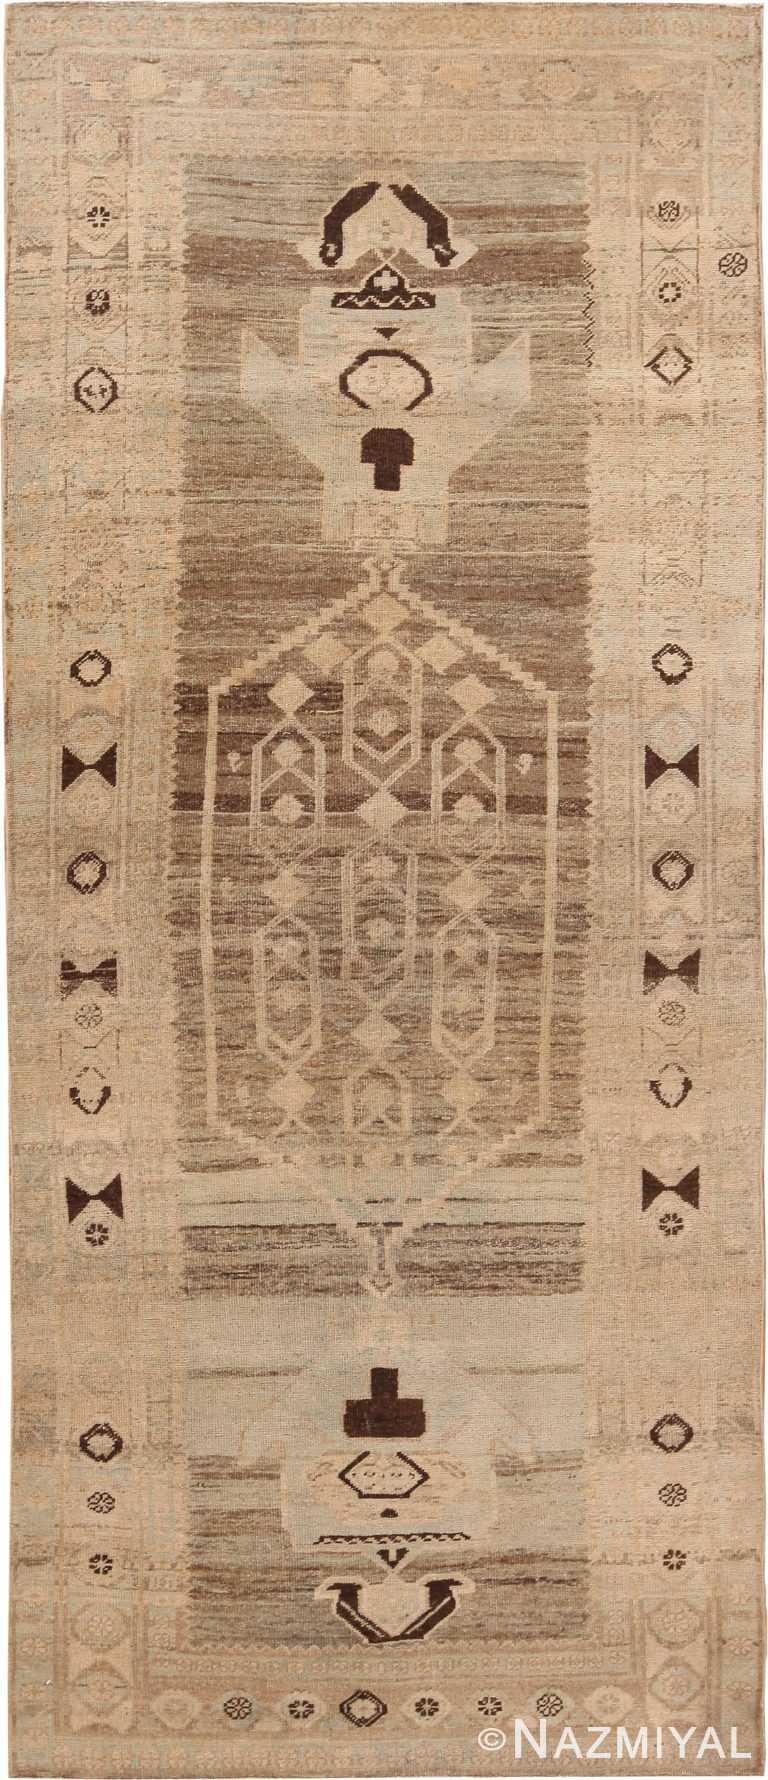 Geometric Antique Persian Bidjar Runner Rug 60527 by Nazmiyal Antique Rugs